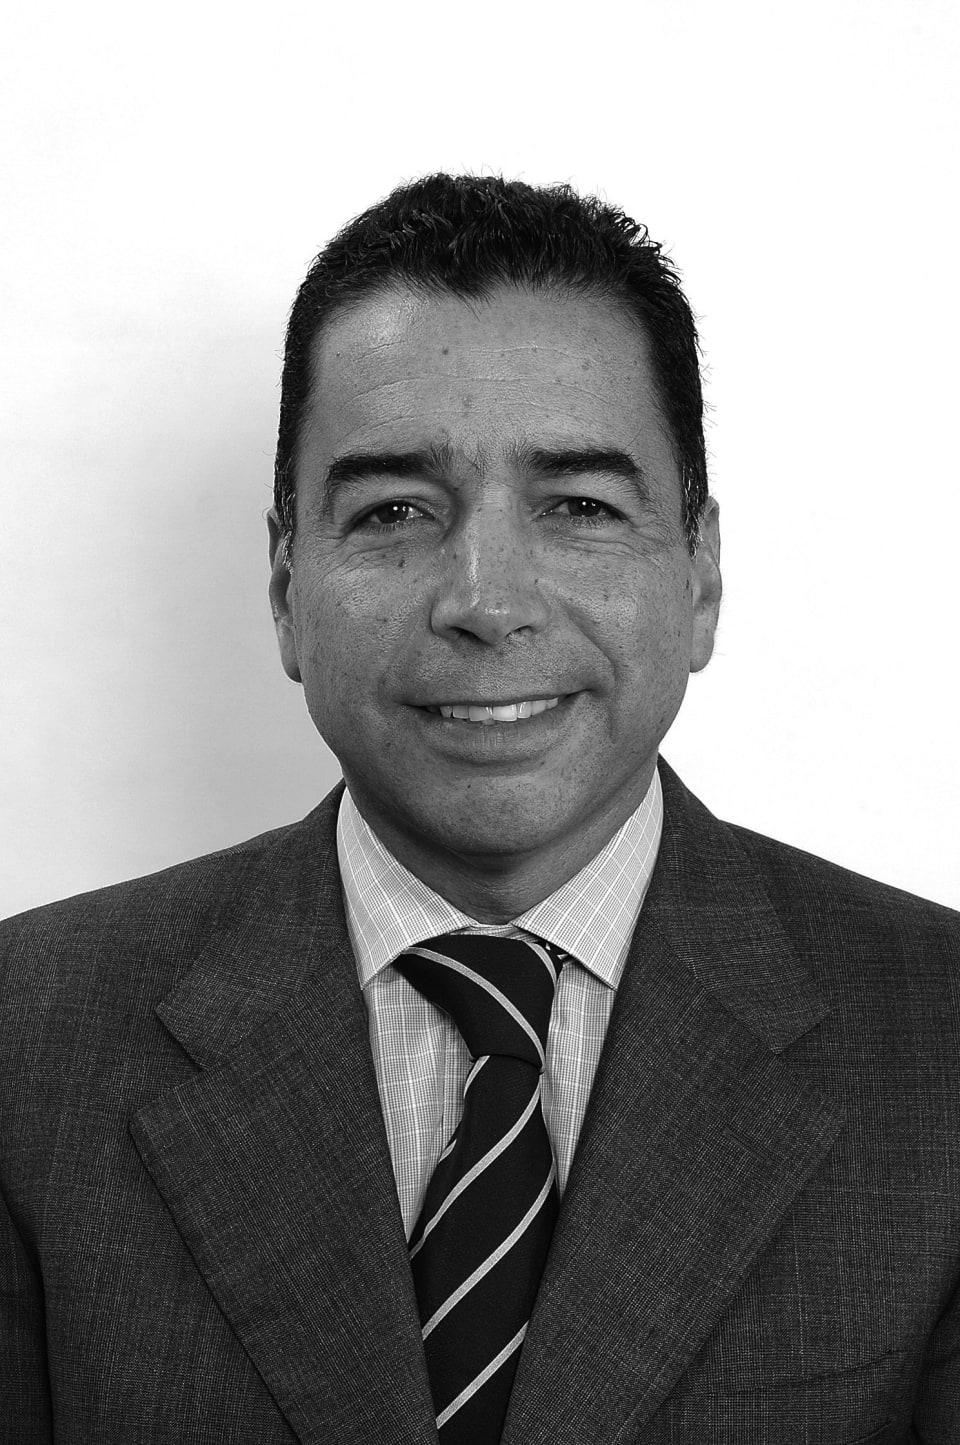 Gerardo Lozano